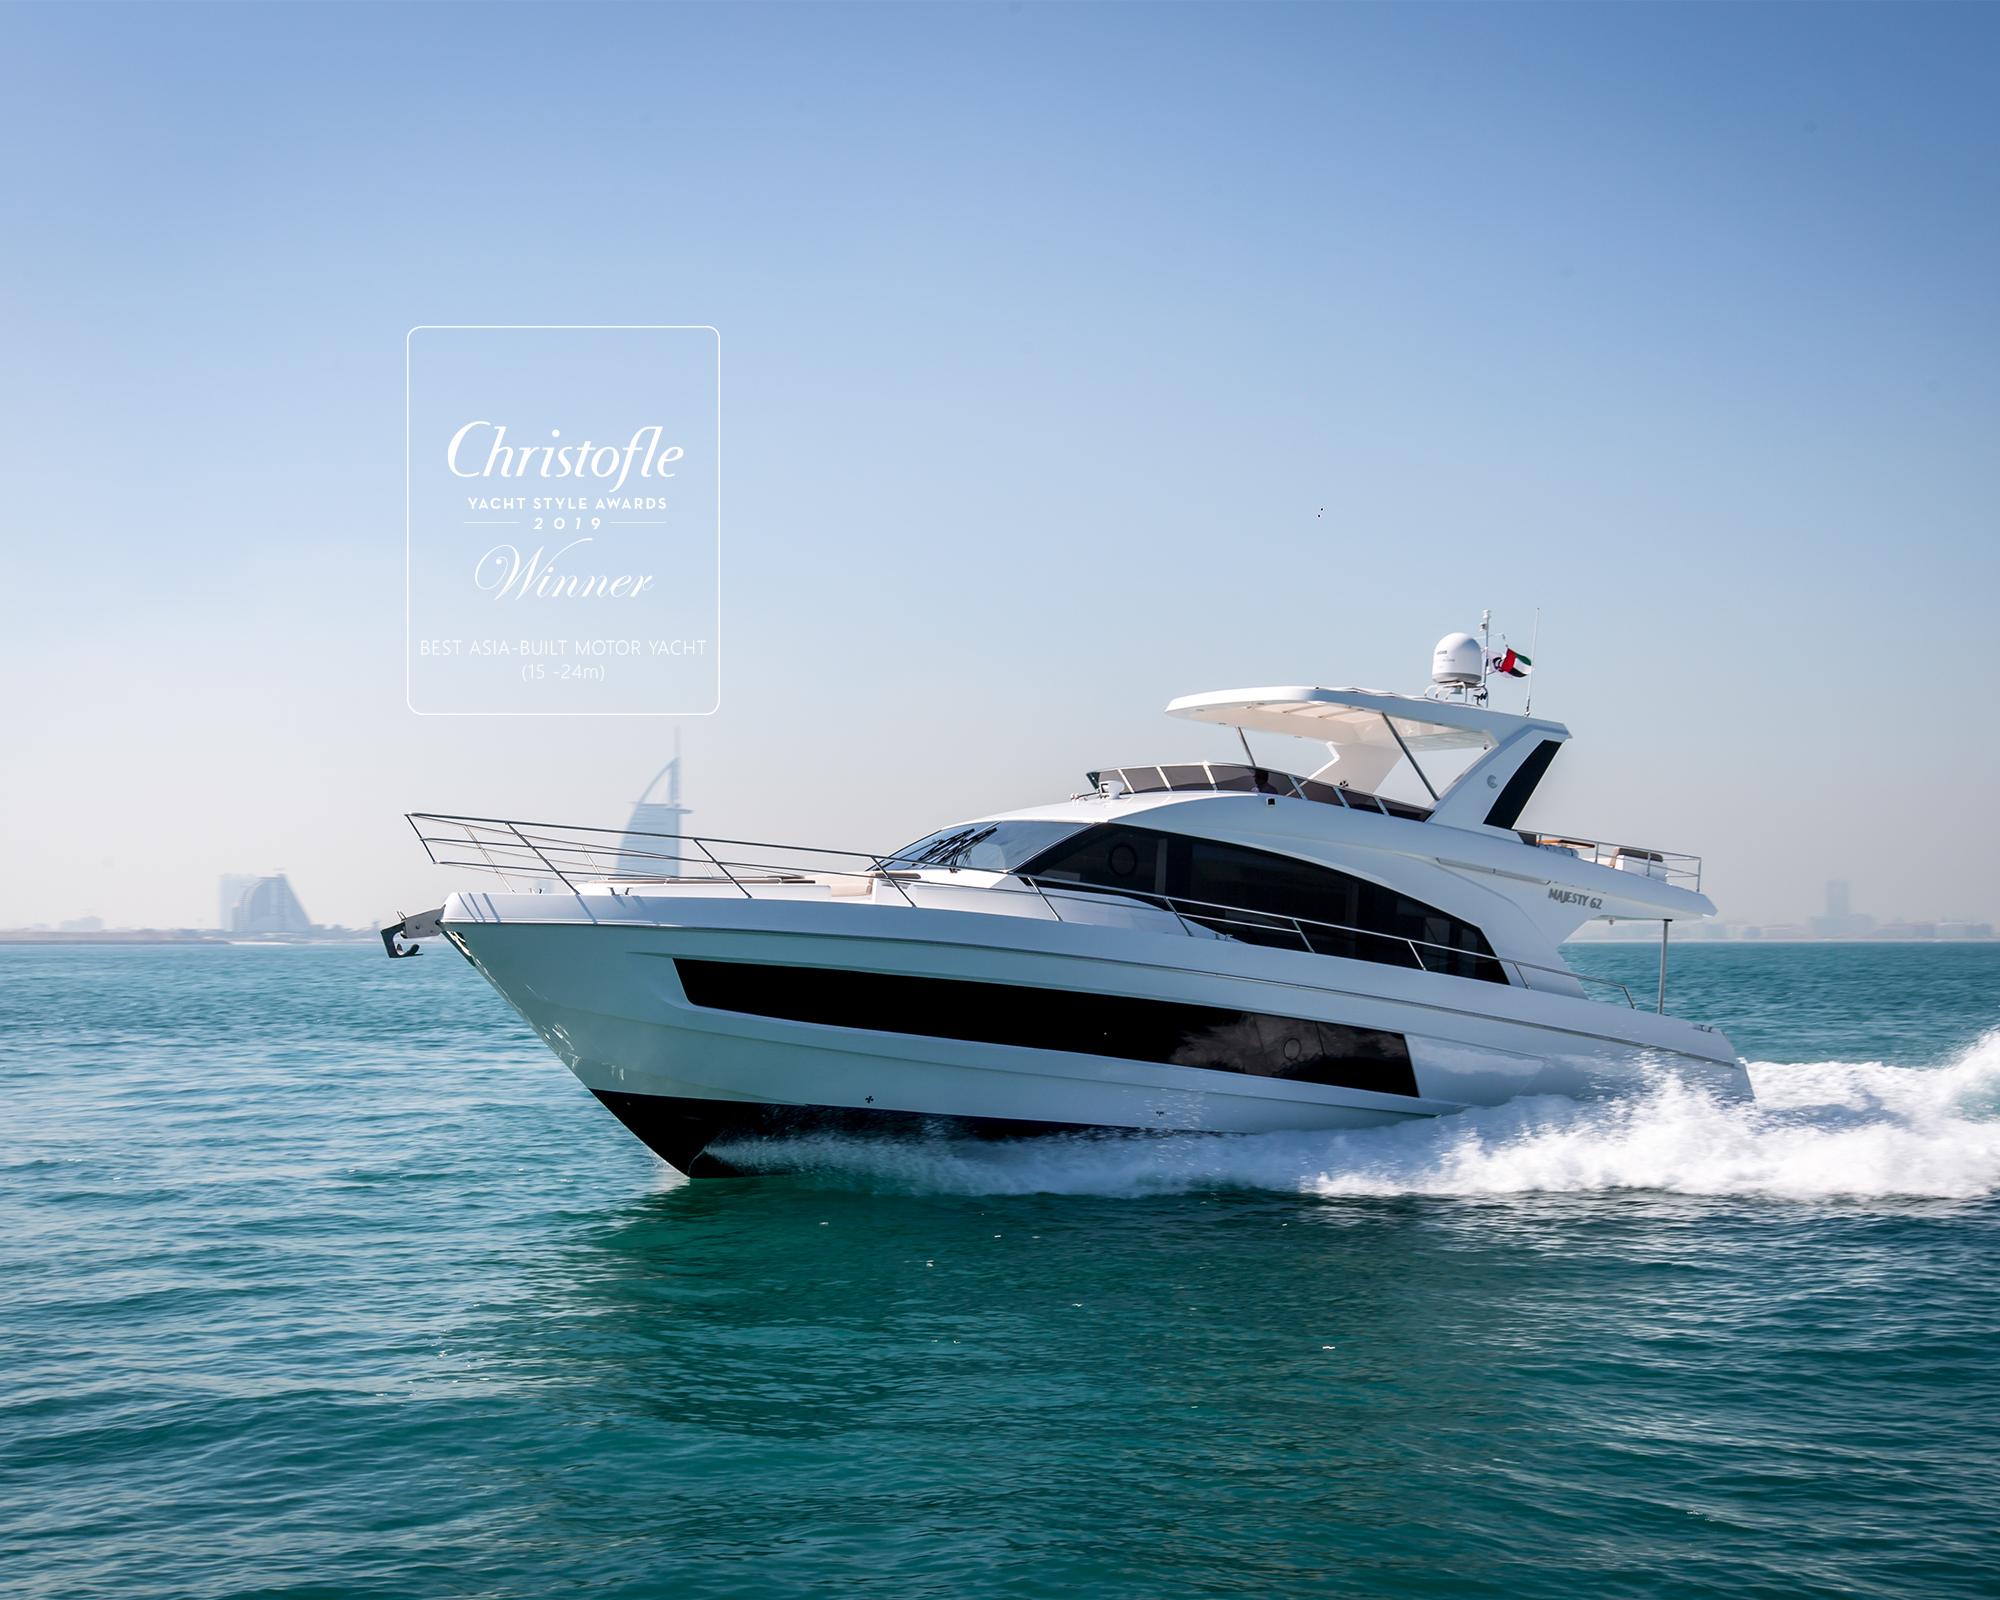 Award-winning Majesty 62 at the Dubai Boat Show 2019